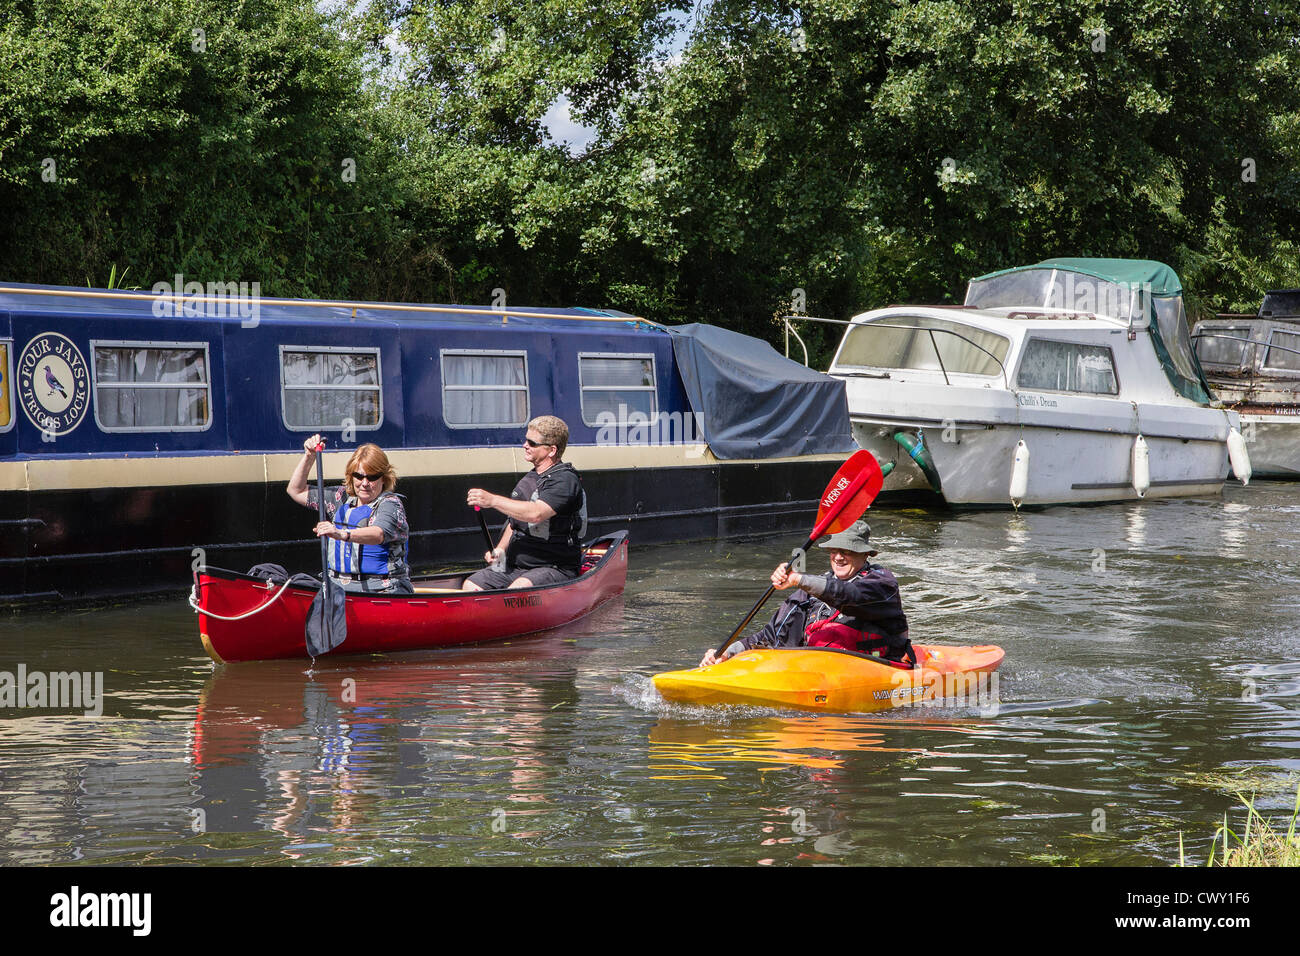 Canoeing on the River Wey Navigation, Send, Surrey, England, UK. Europe - Stock Image